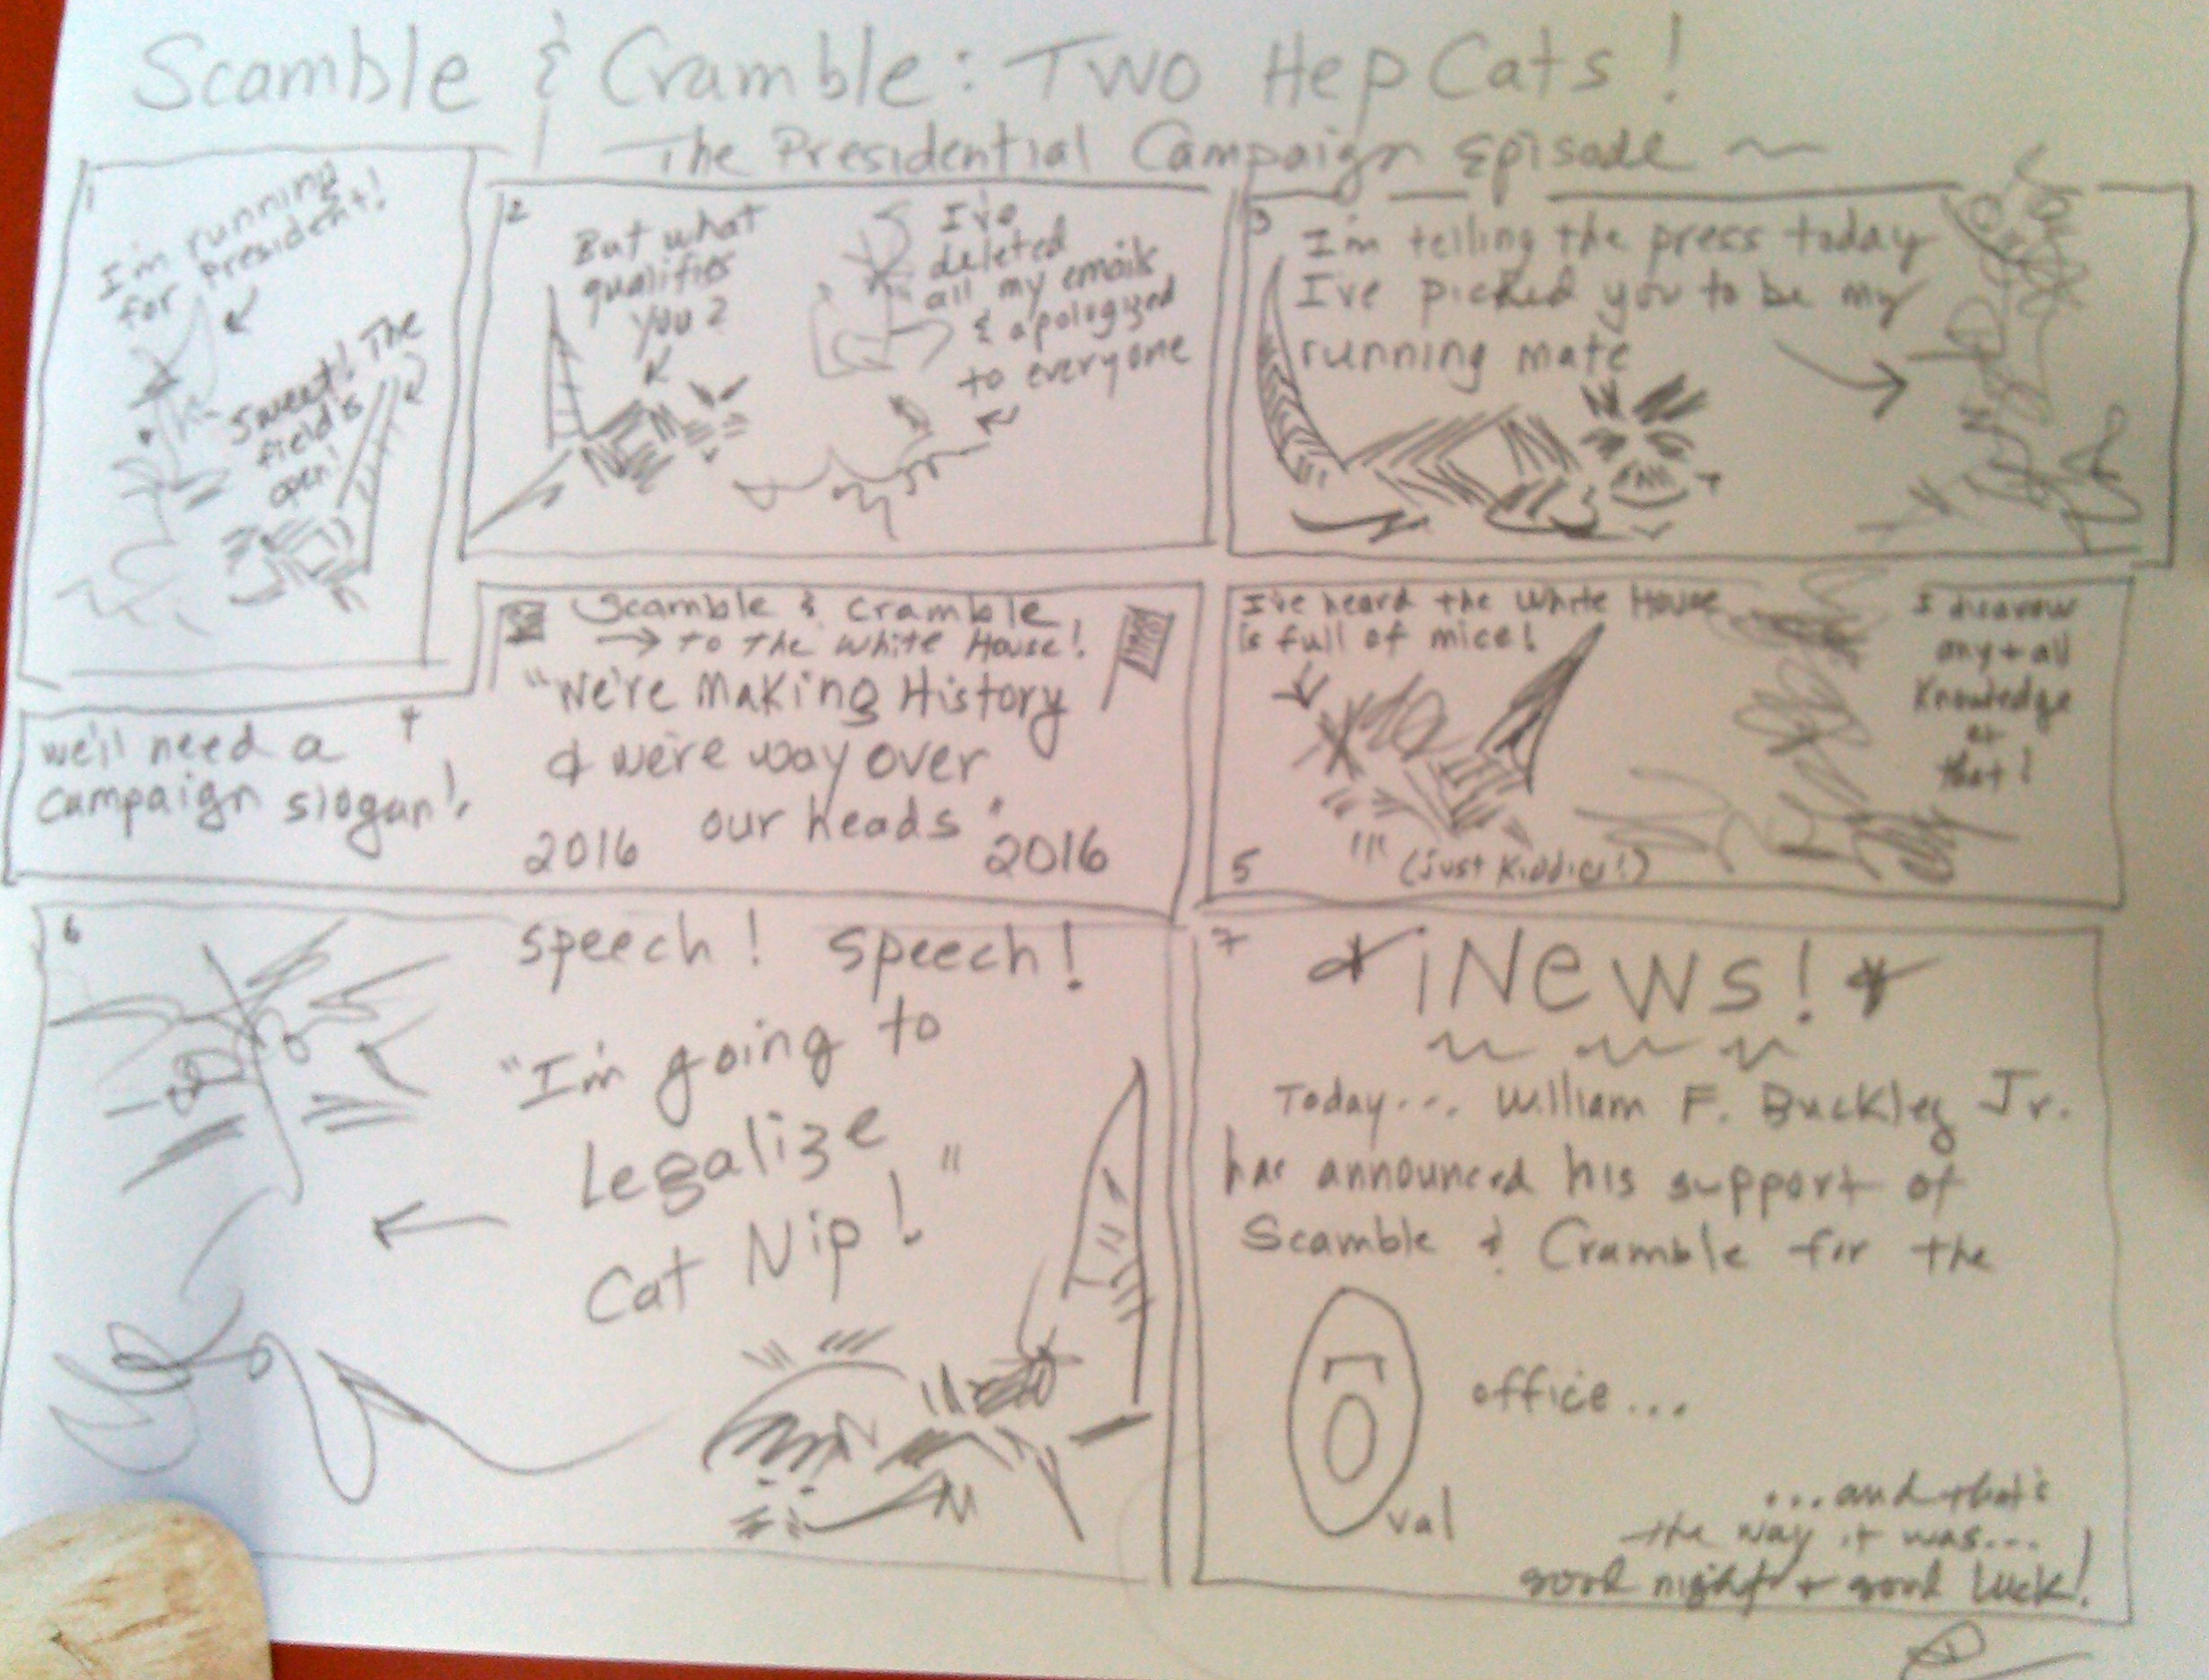 Scamble & Cramble Run for Office 1